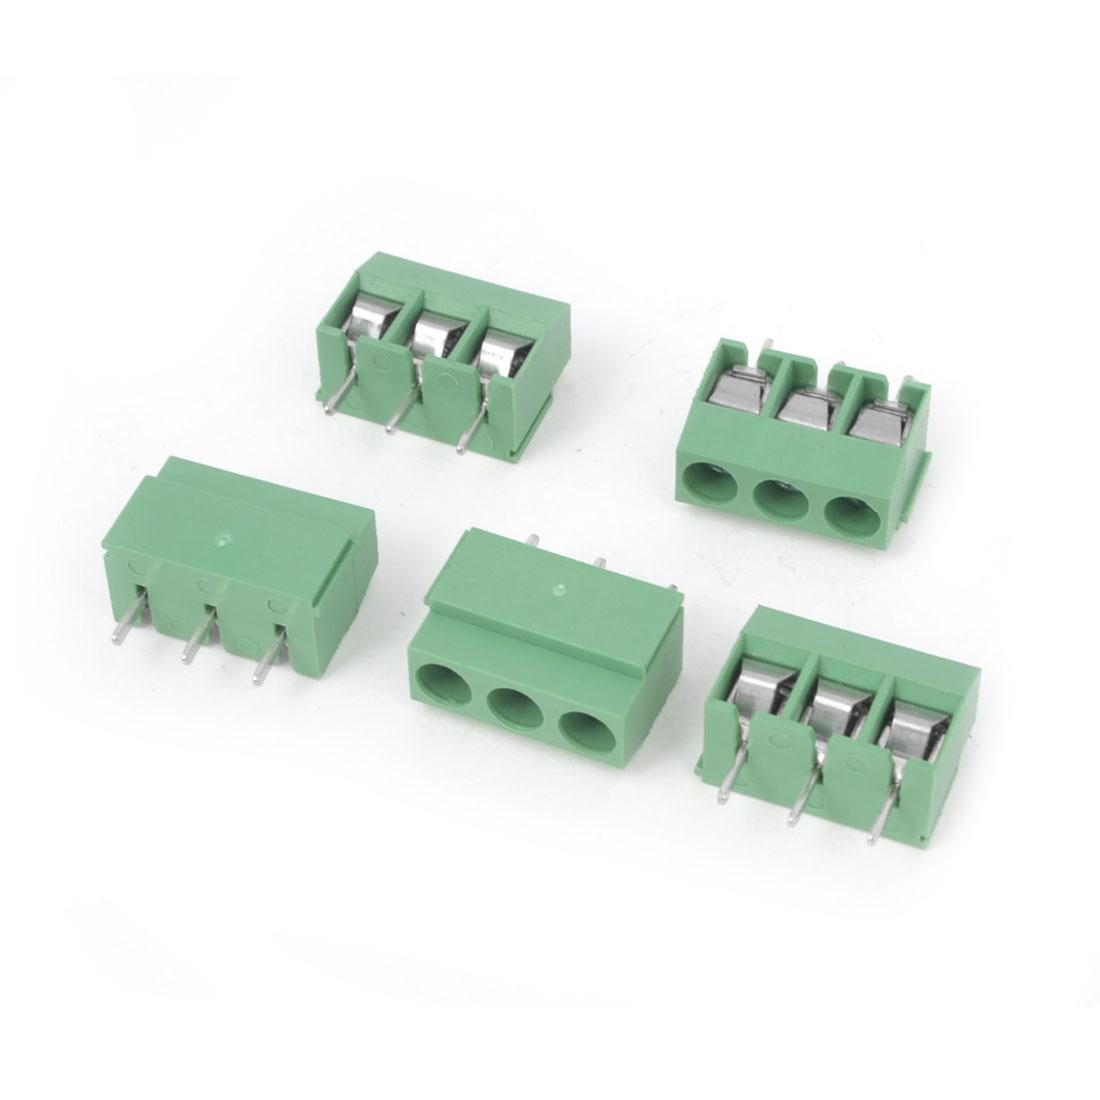 5 Pcs 300V 10A 3P Poles 5mm Pitch PCB Mount Screw Terminal Block Connector Green